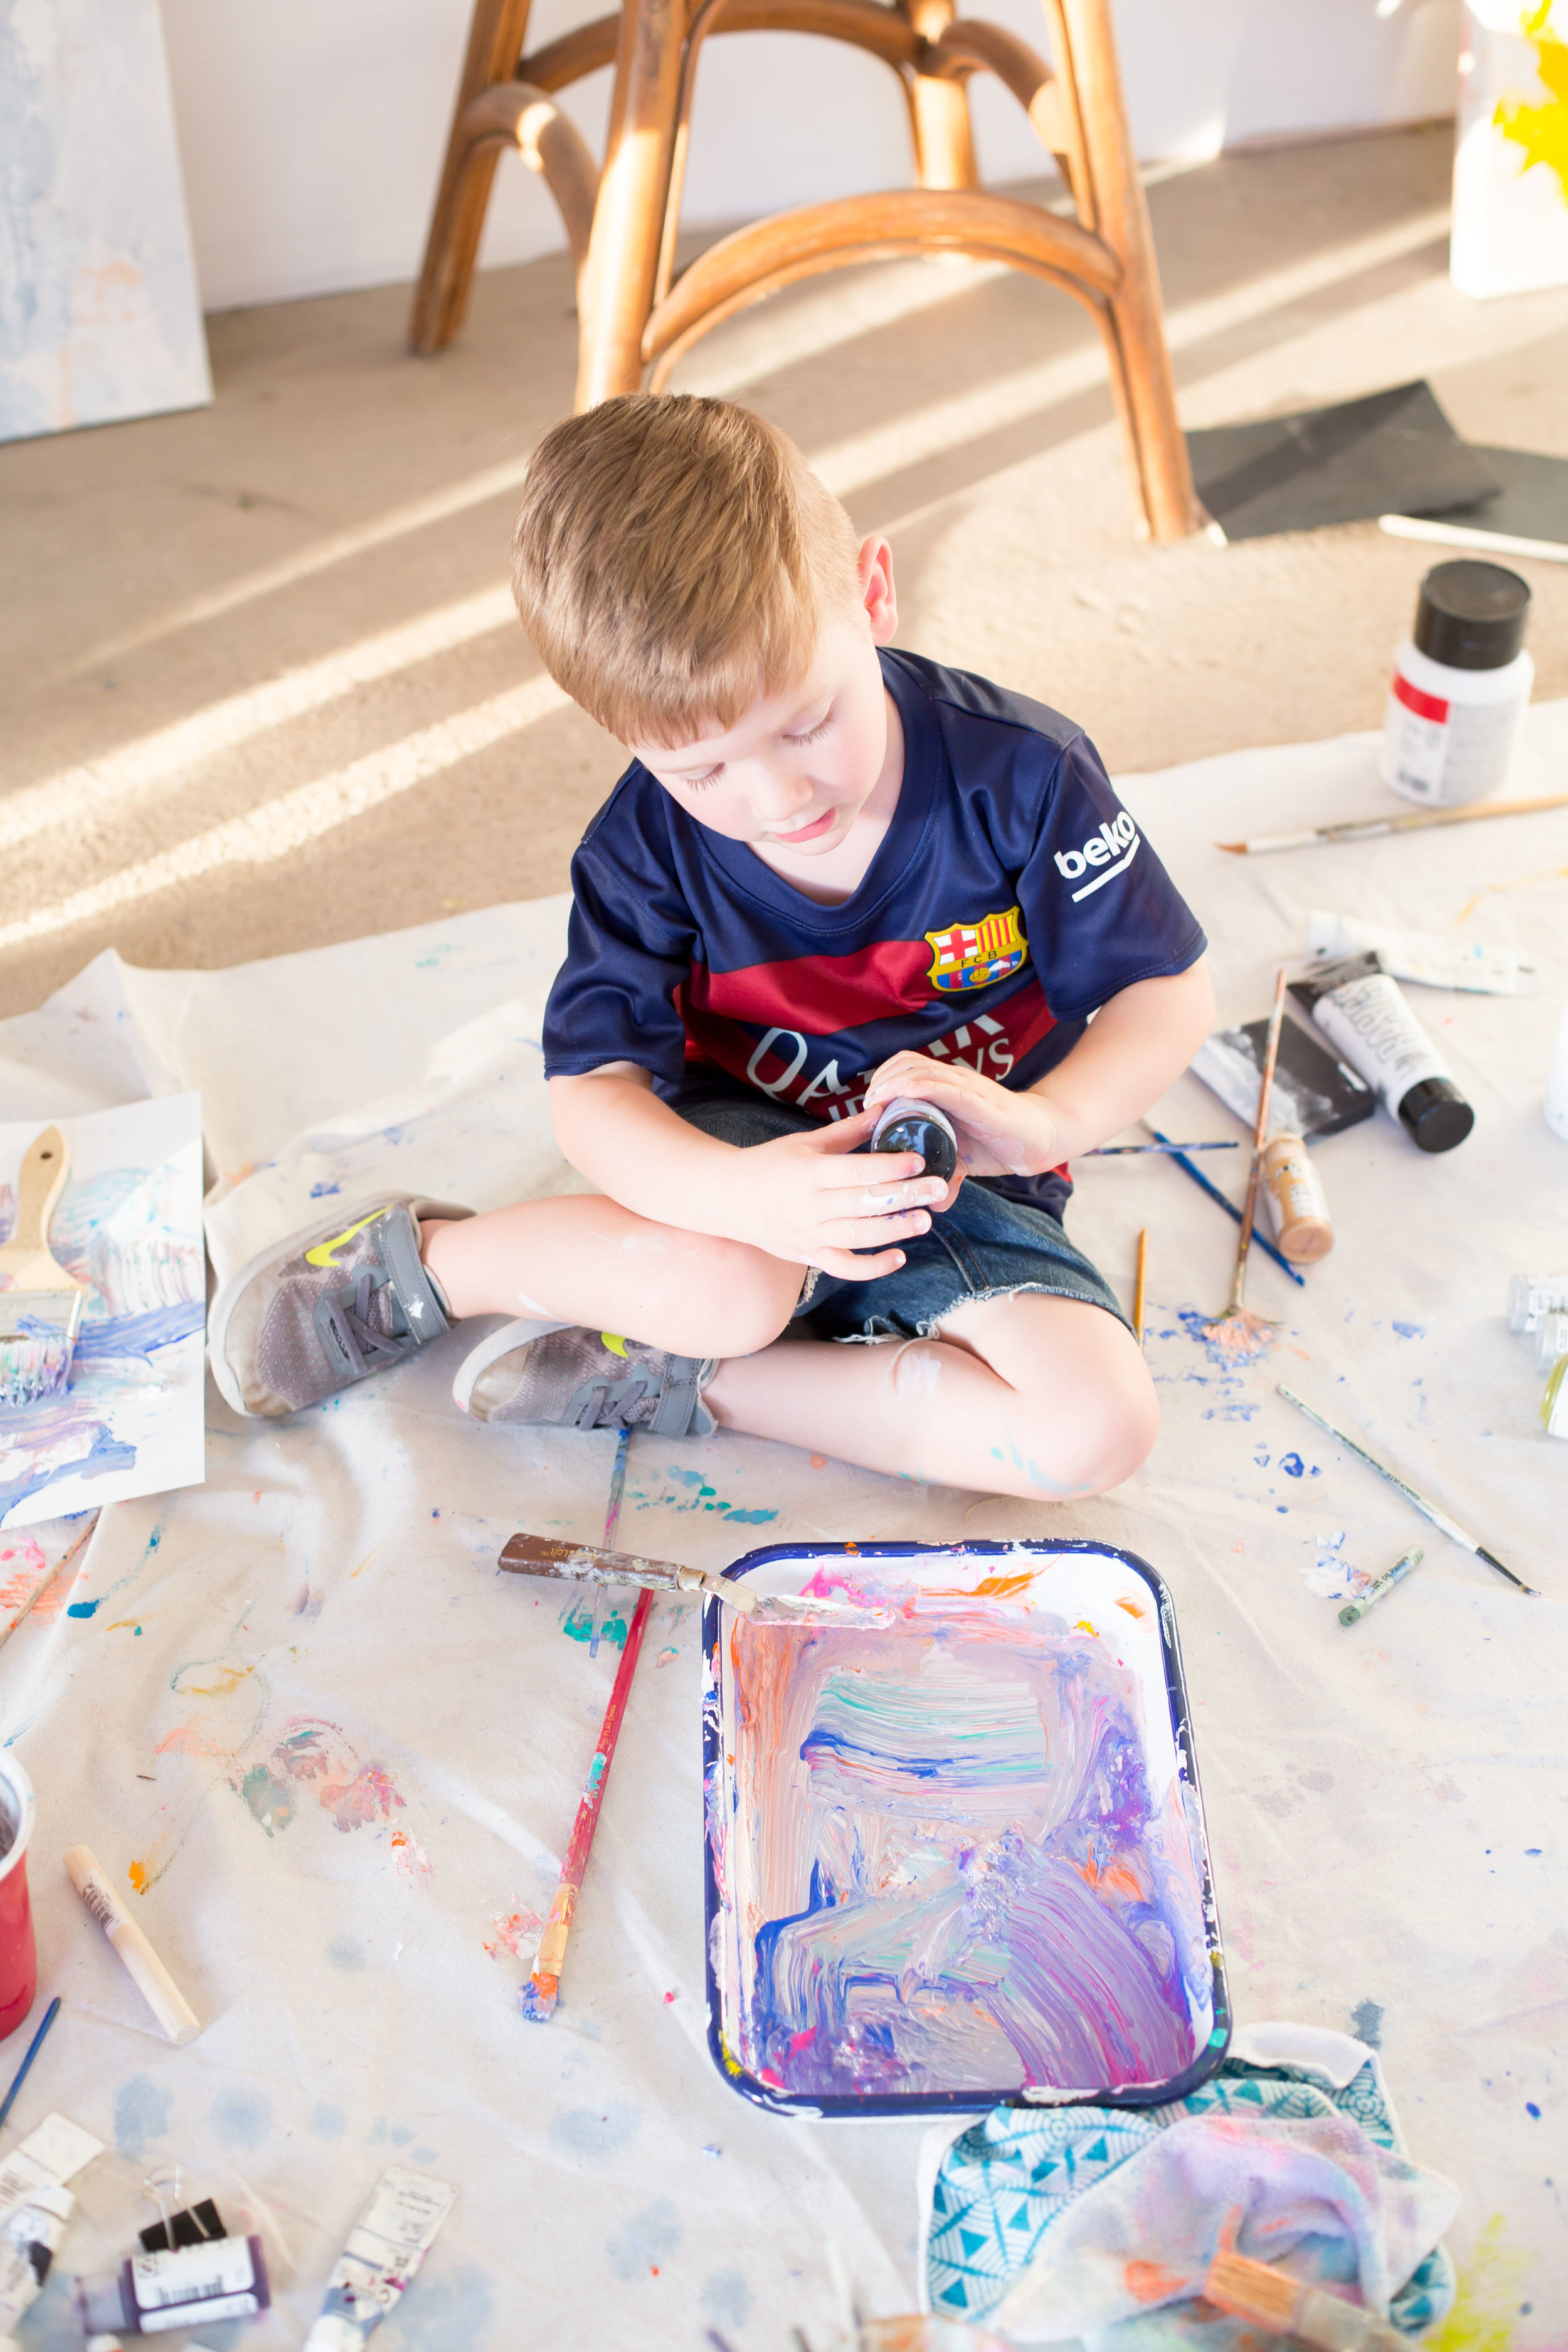 san-diego-branding-photographer-kids-painting-samantha-louise-marett-artist-2